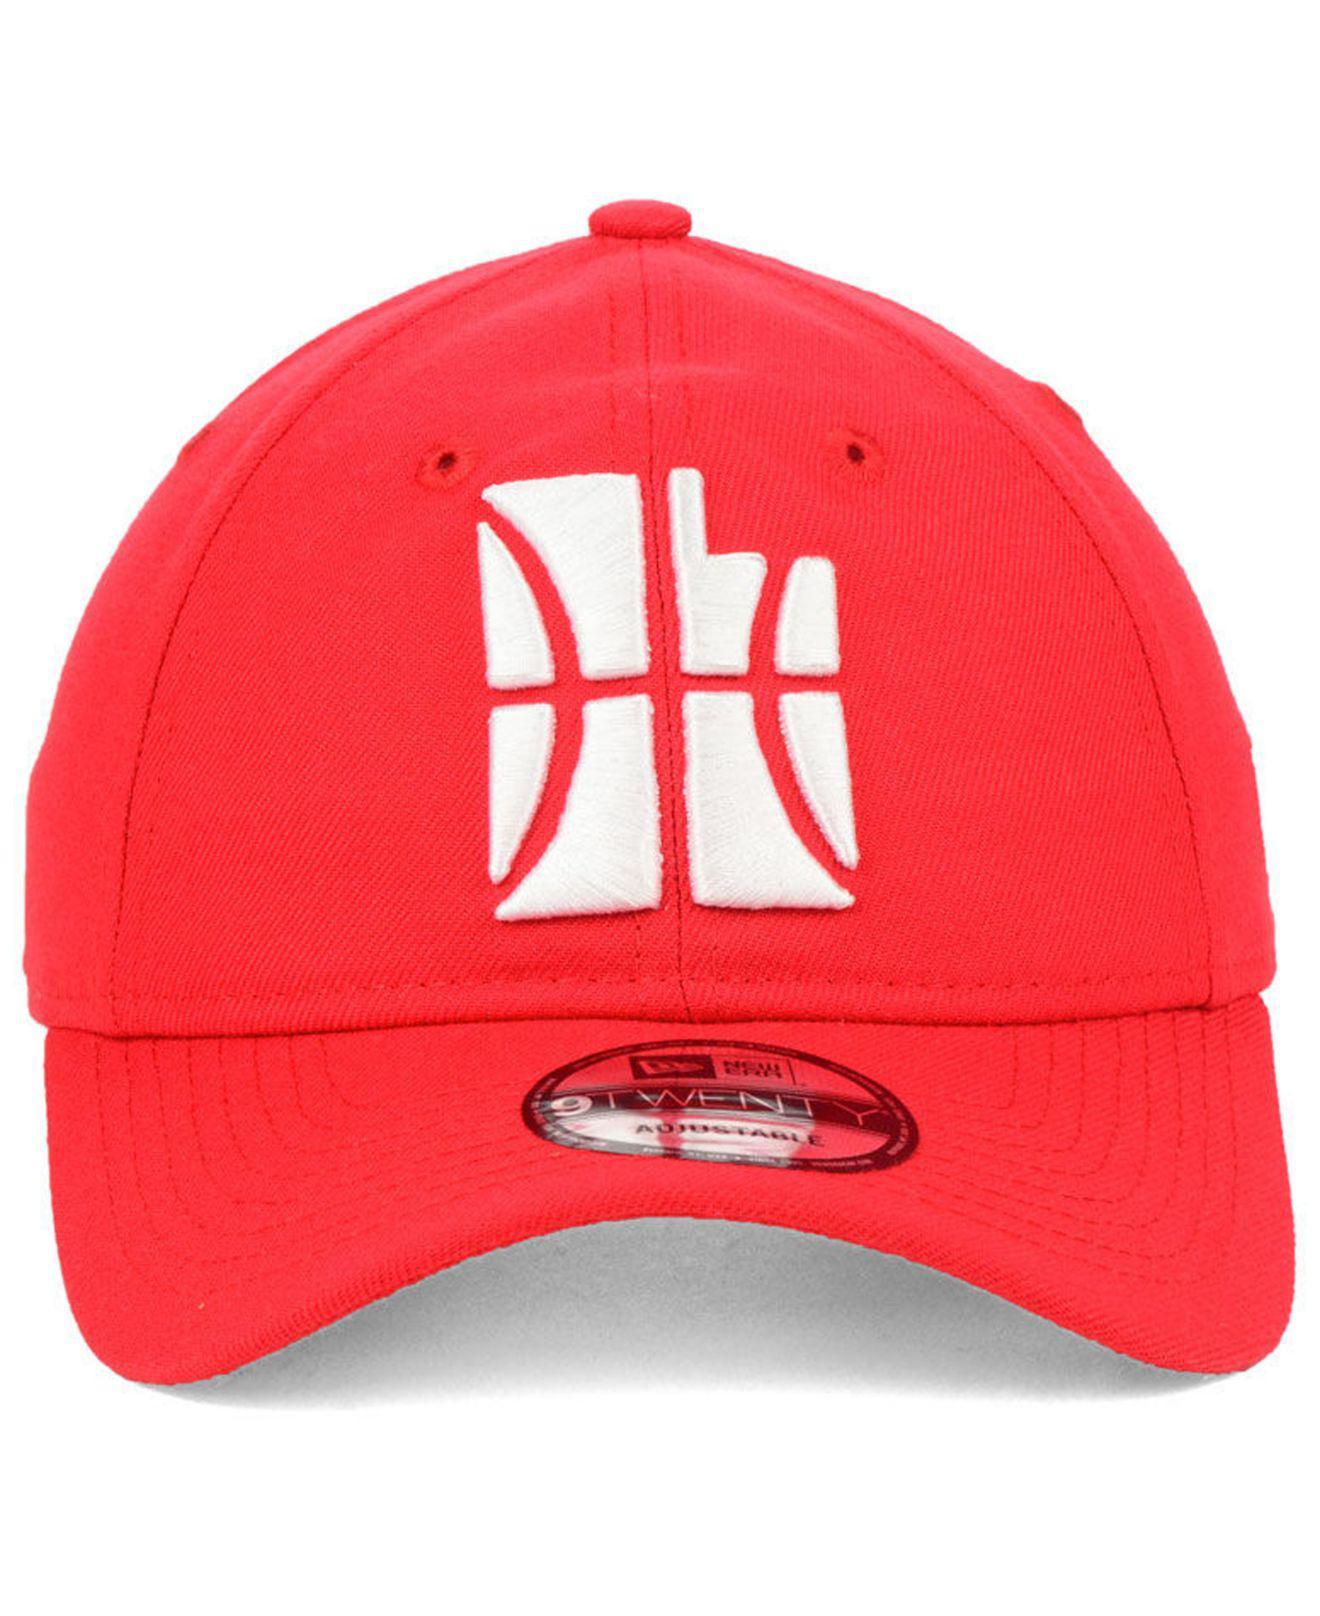 f88e0366 KTZ Utah Jazz City Series 9twenty Strapback Cap in Red for Men - Lyst